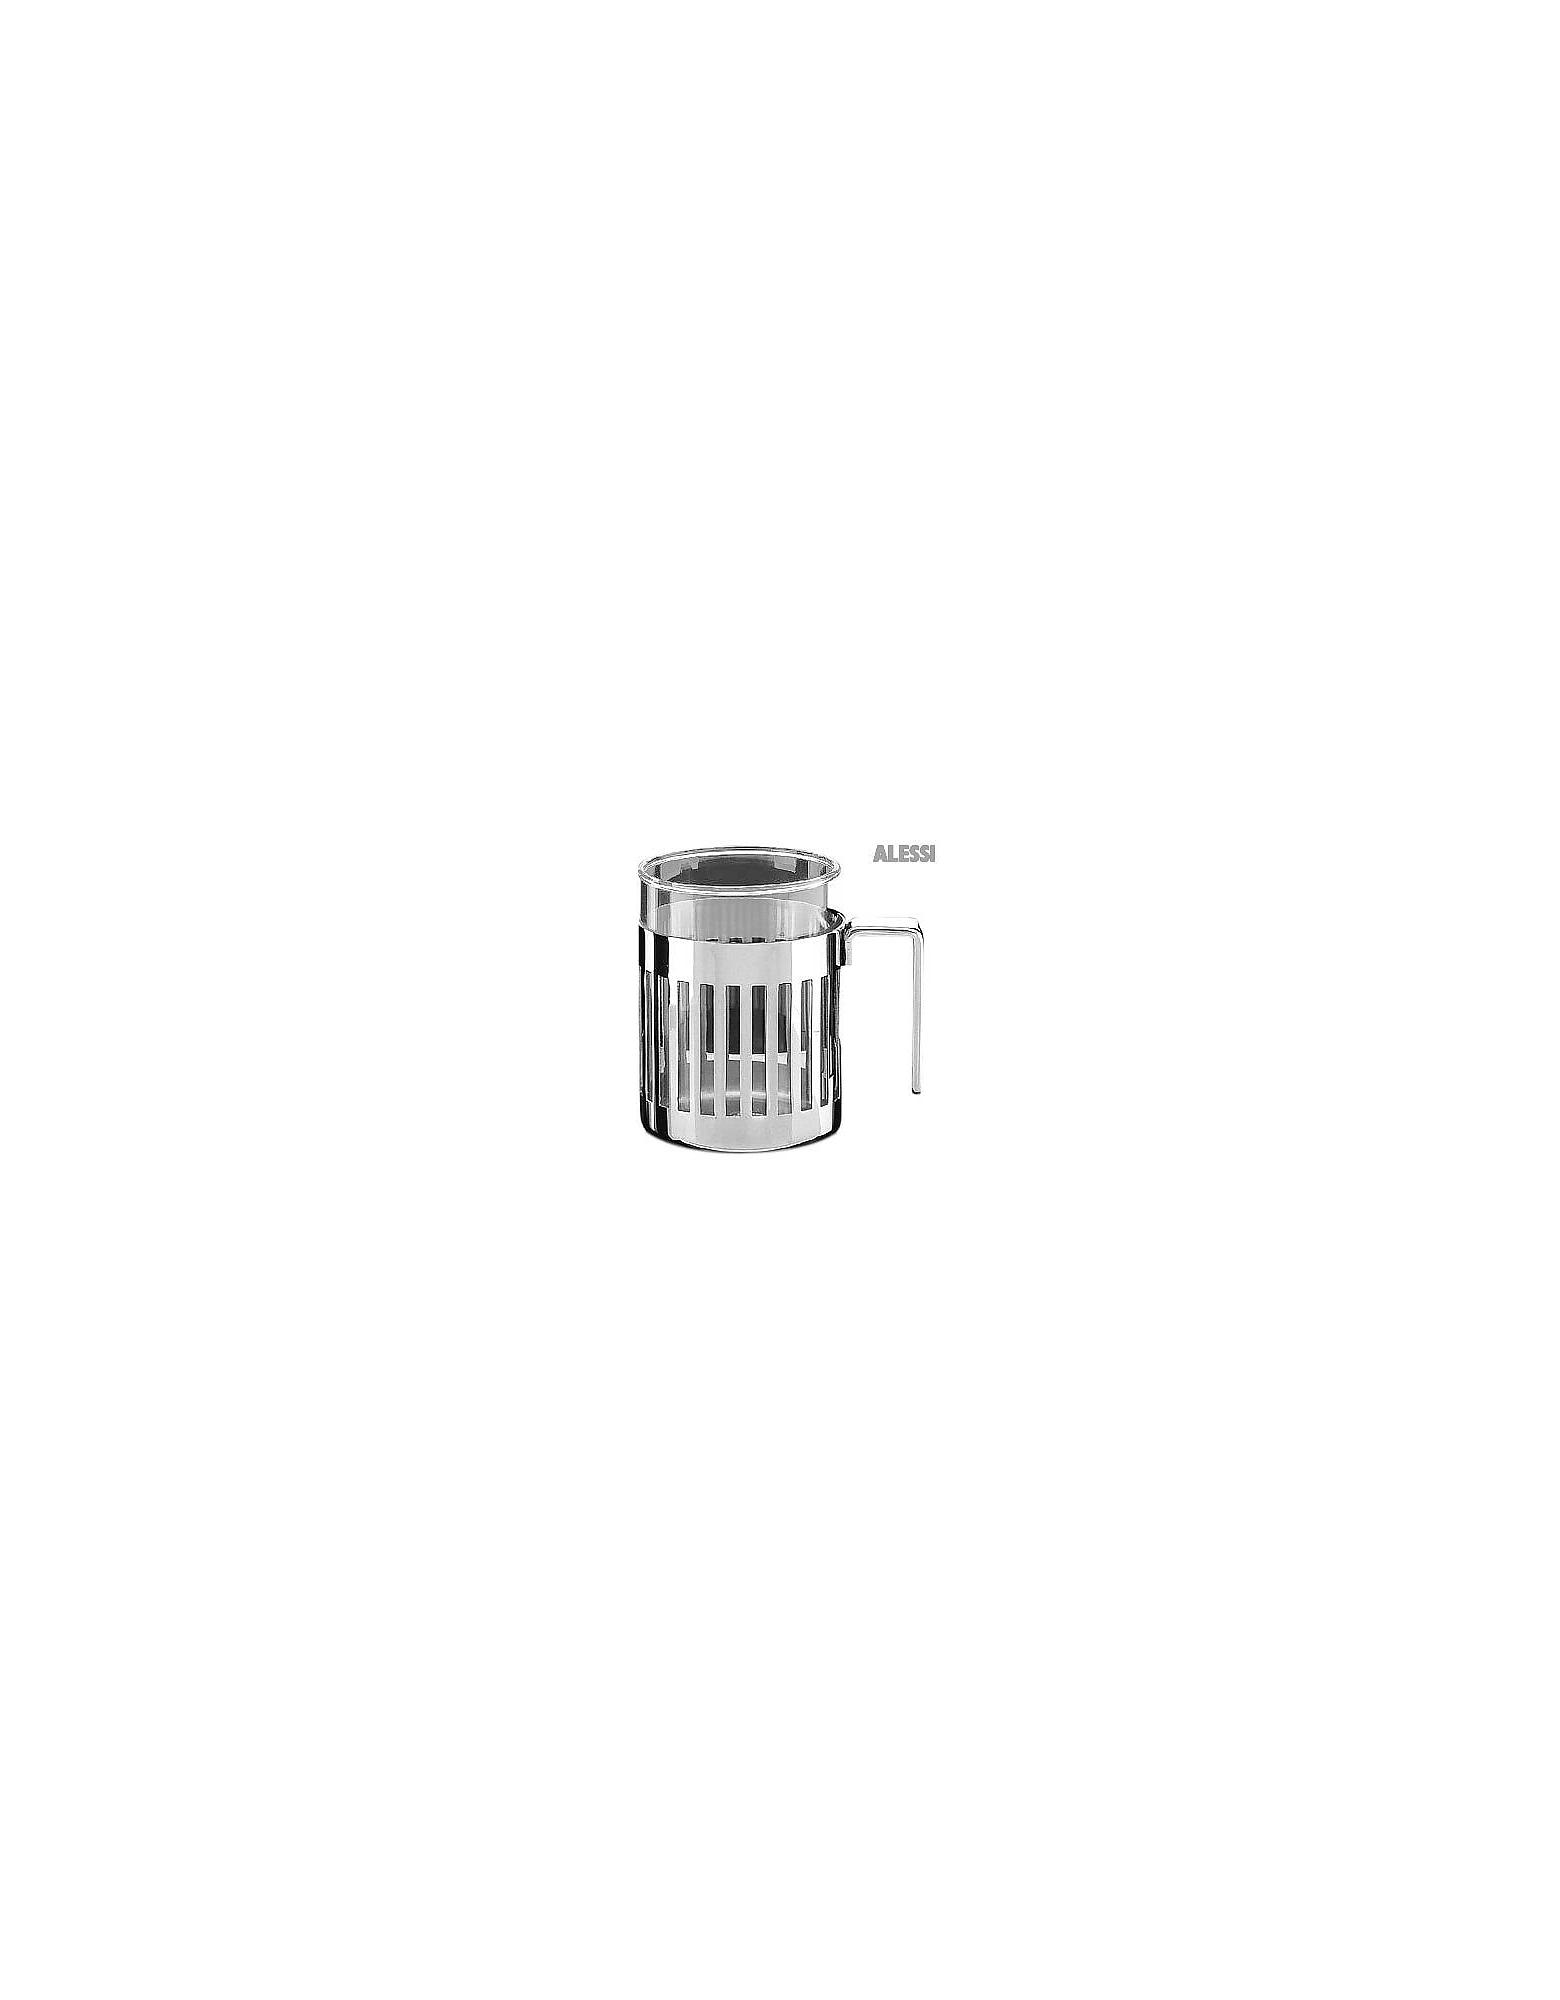 Alessi Designer Kitchen & Dining, Stainless Steel Mug